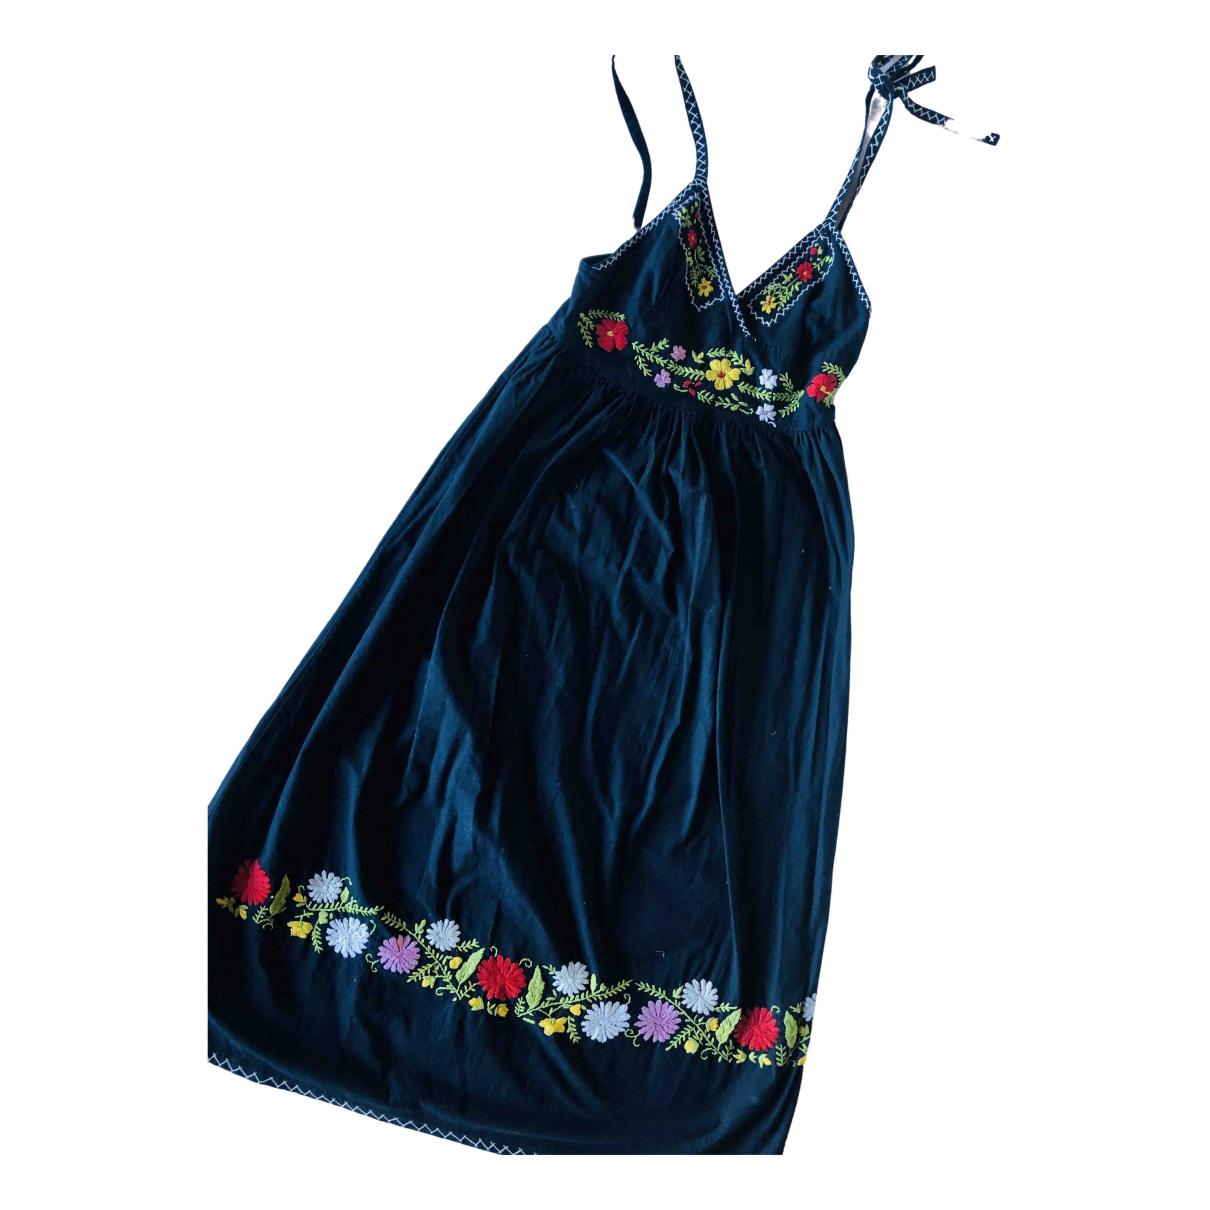 Candela \N Kleid in  Schwarz Baumwolle